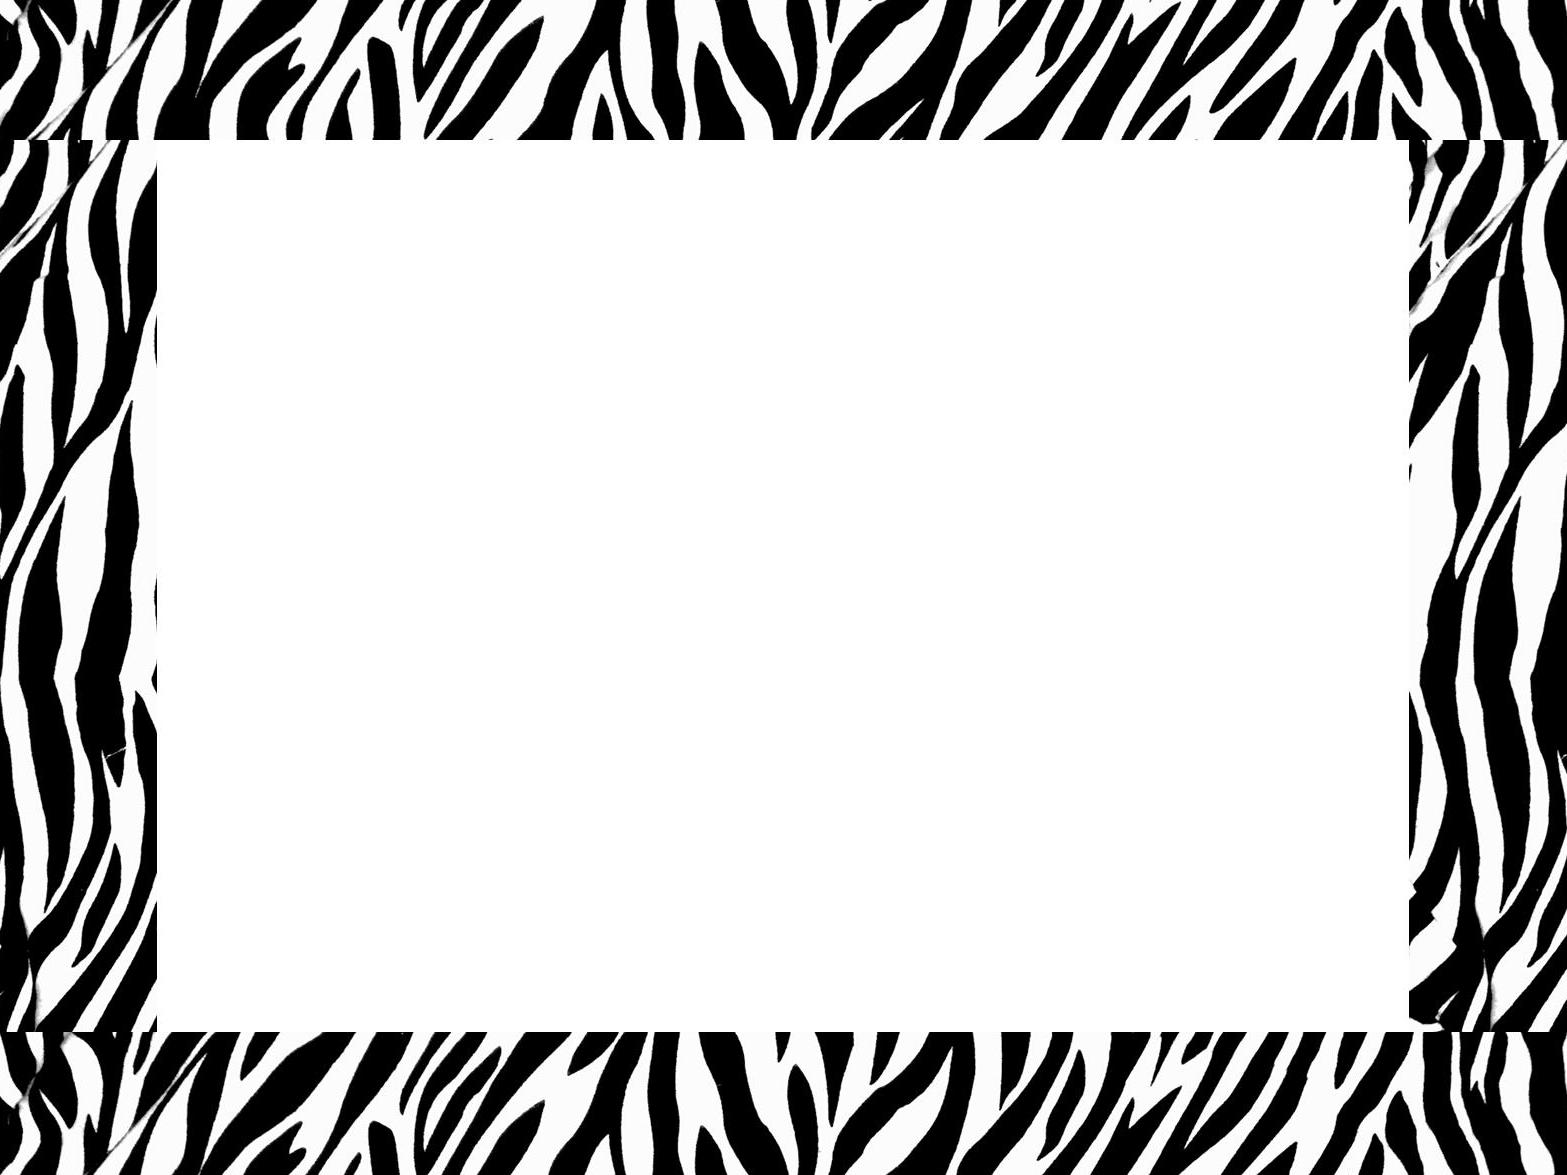 Clipart zebra border. Free print download clip